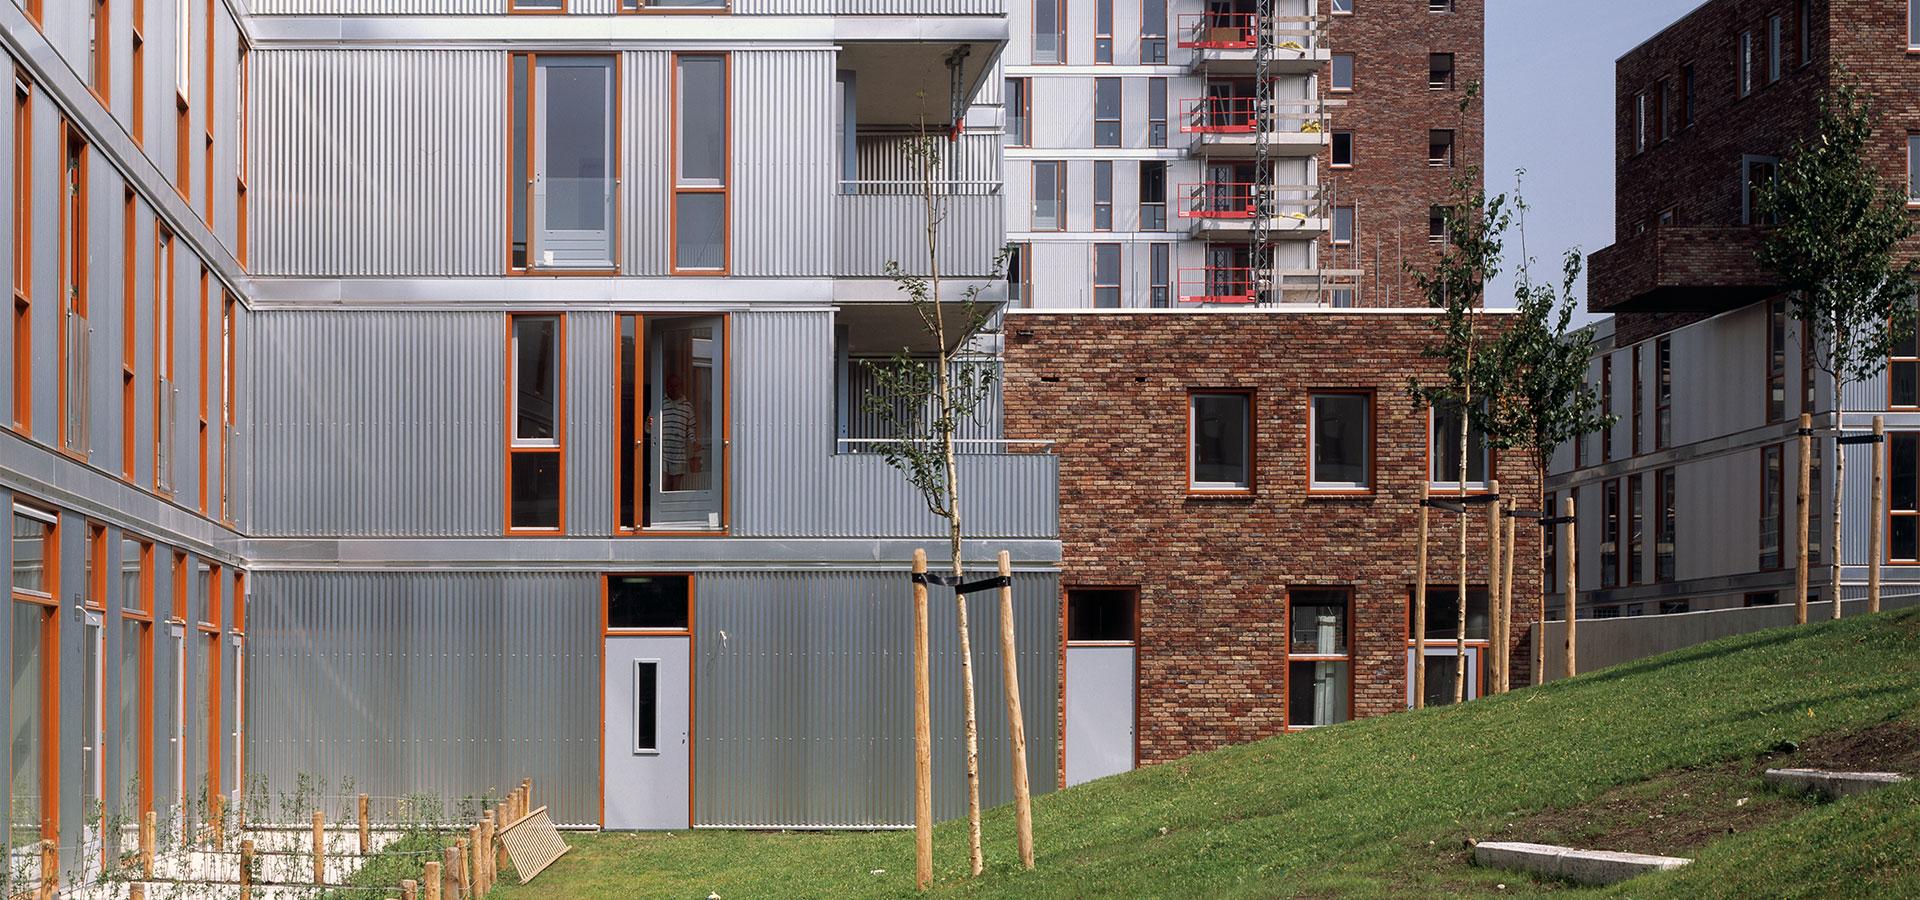 FARO architecten Geuzentuinen Amsterdam 11